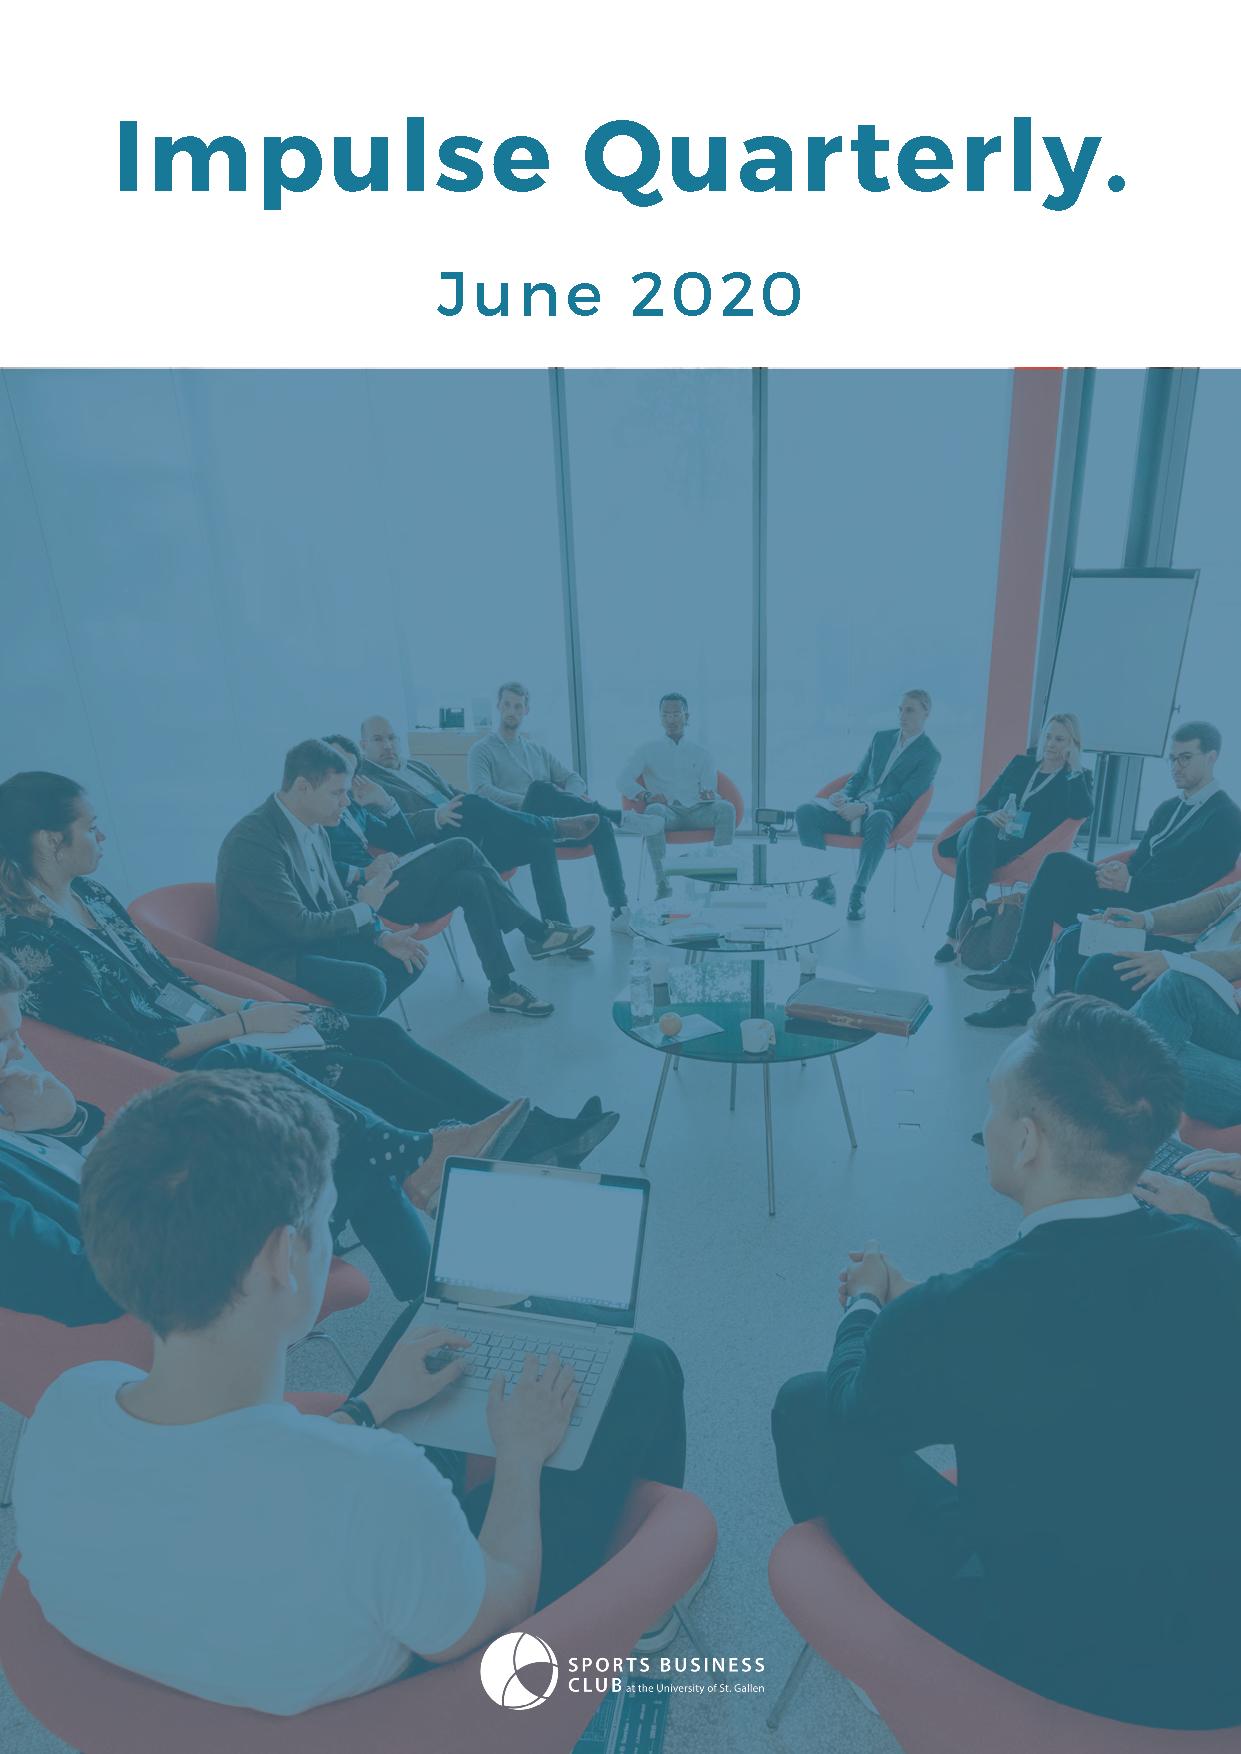 Impulse Quarterly June 2020